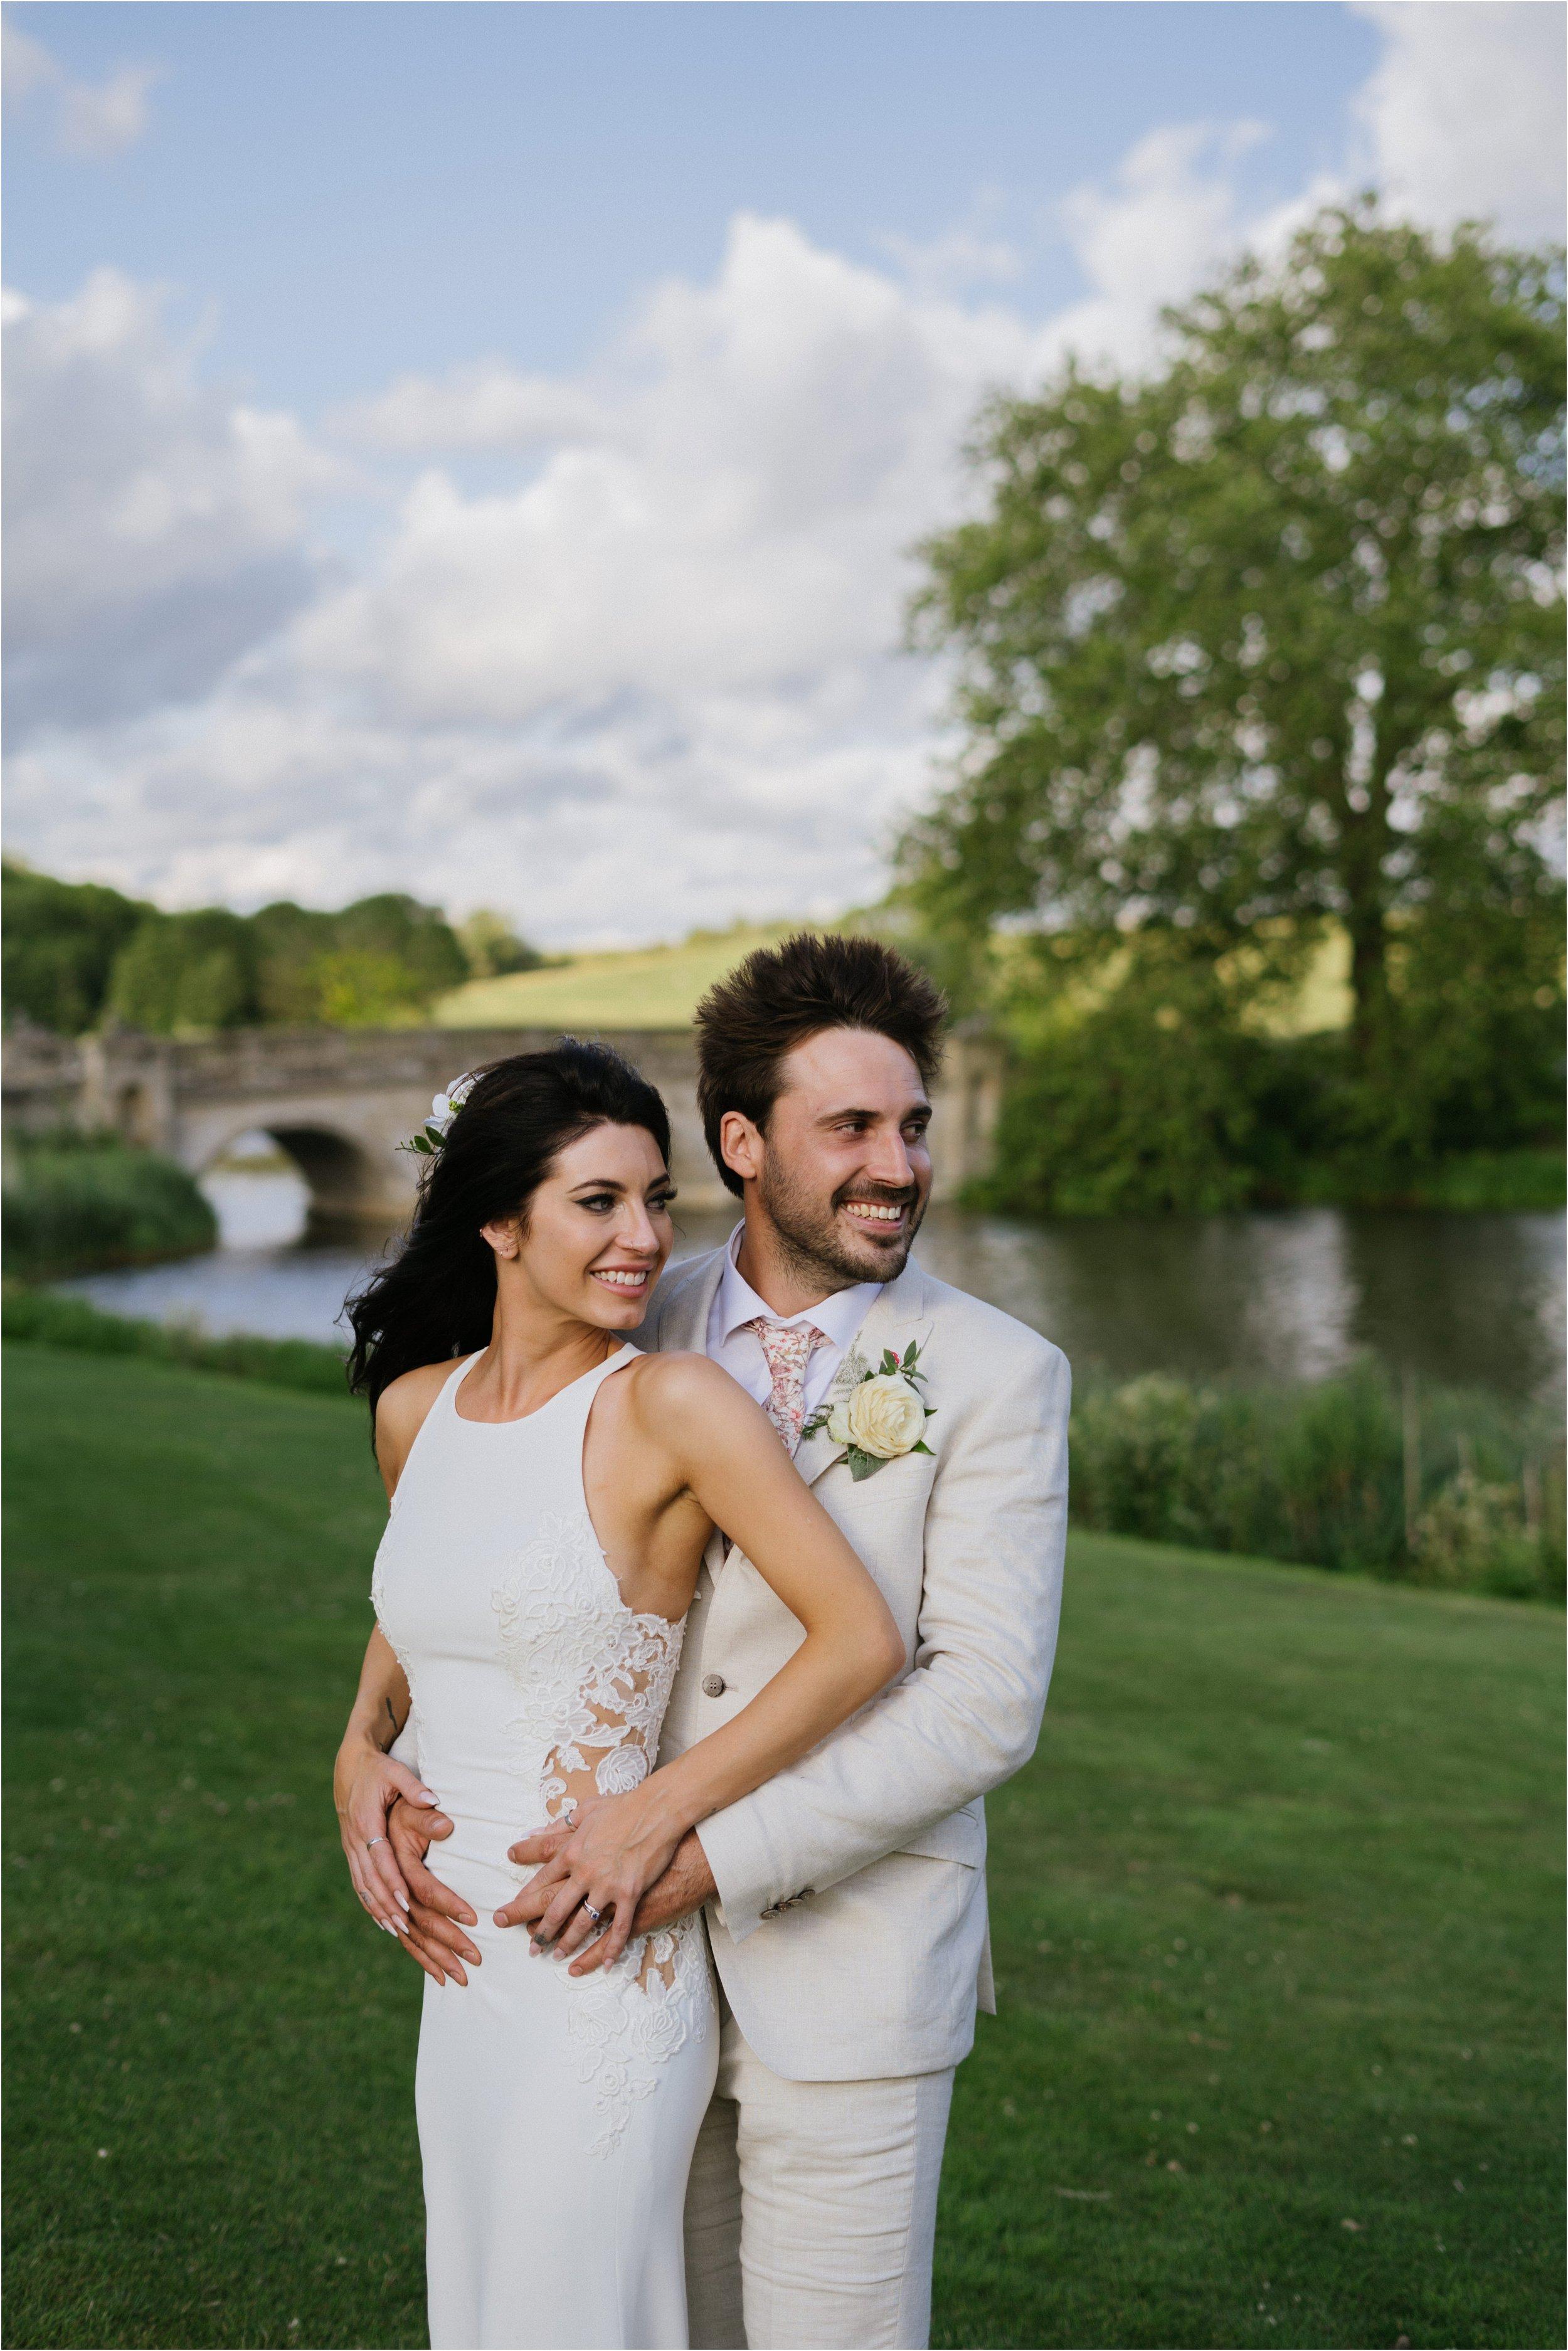 Compton Verney wedding photography_0130.jpg